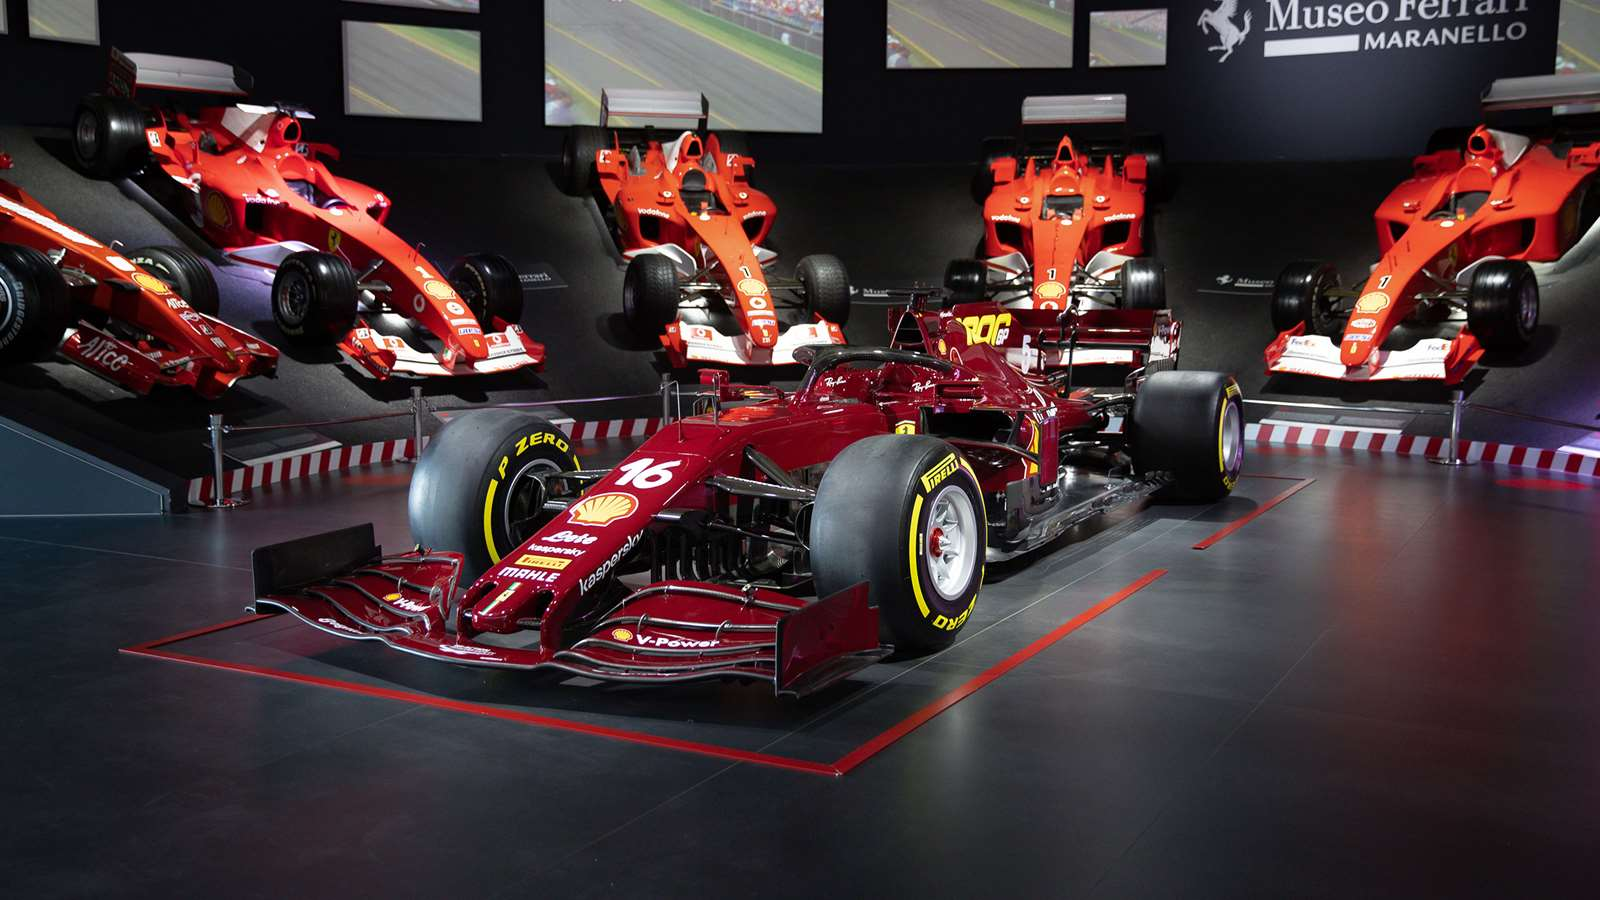 Ferrari Sf1000 Replica Sells For 1m Grr